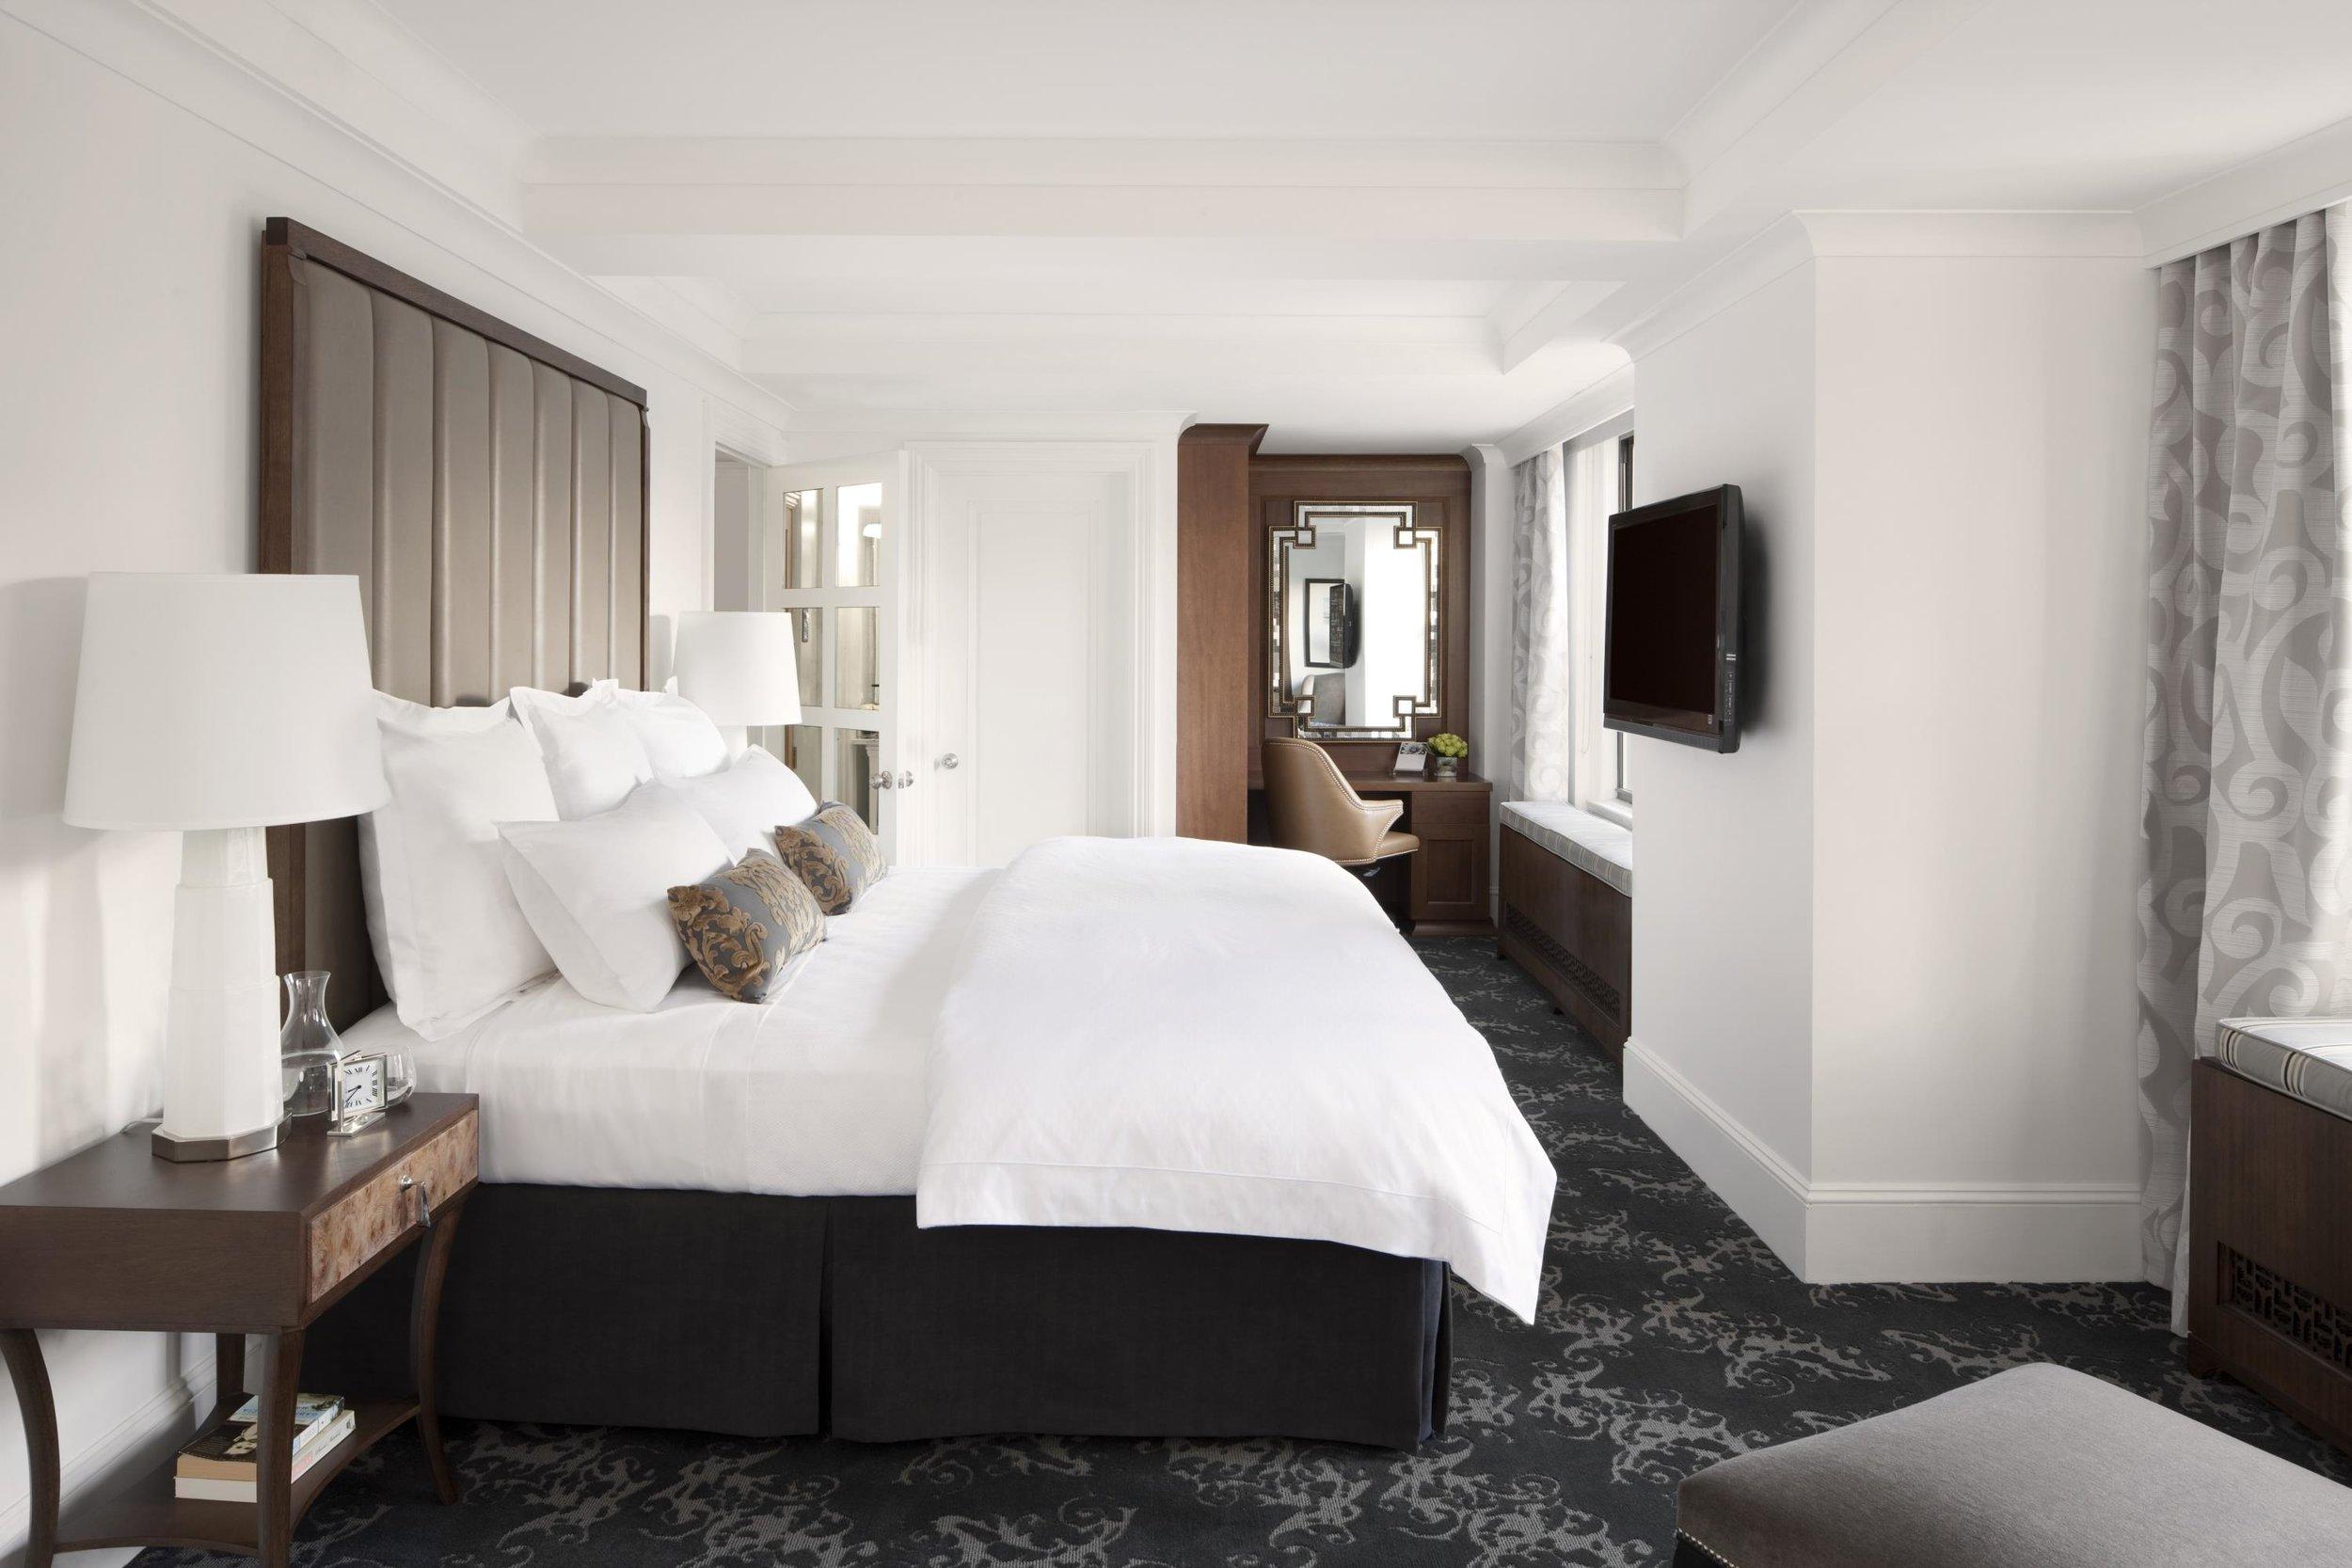 2b_The_Surrey_Presidential_Suite_Bedroom_38611_high.jpeg